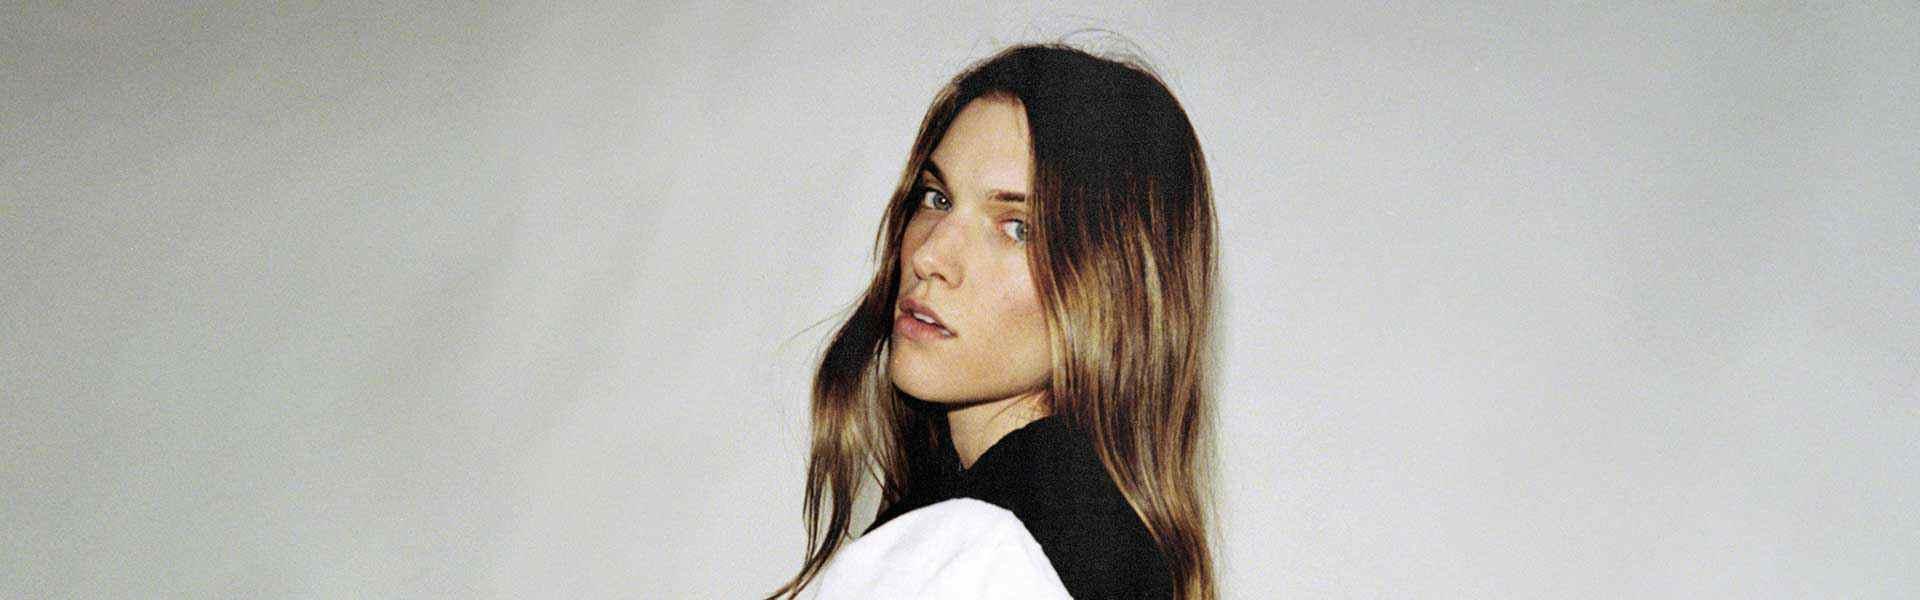 Charlotte Cardin (Photo: Amy Stewart)